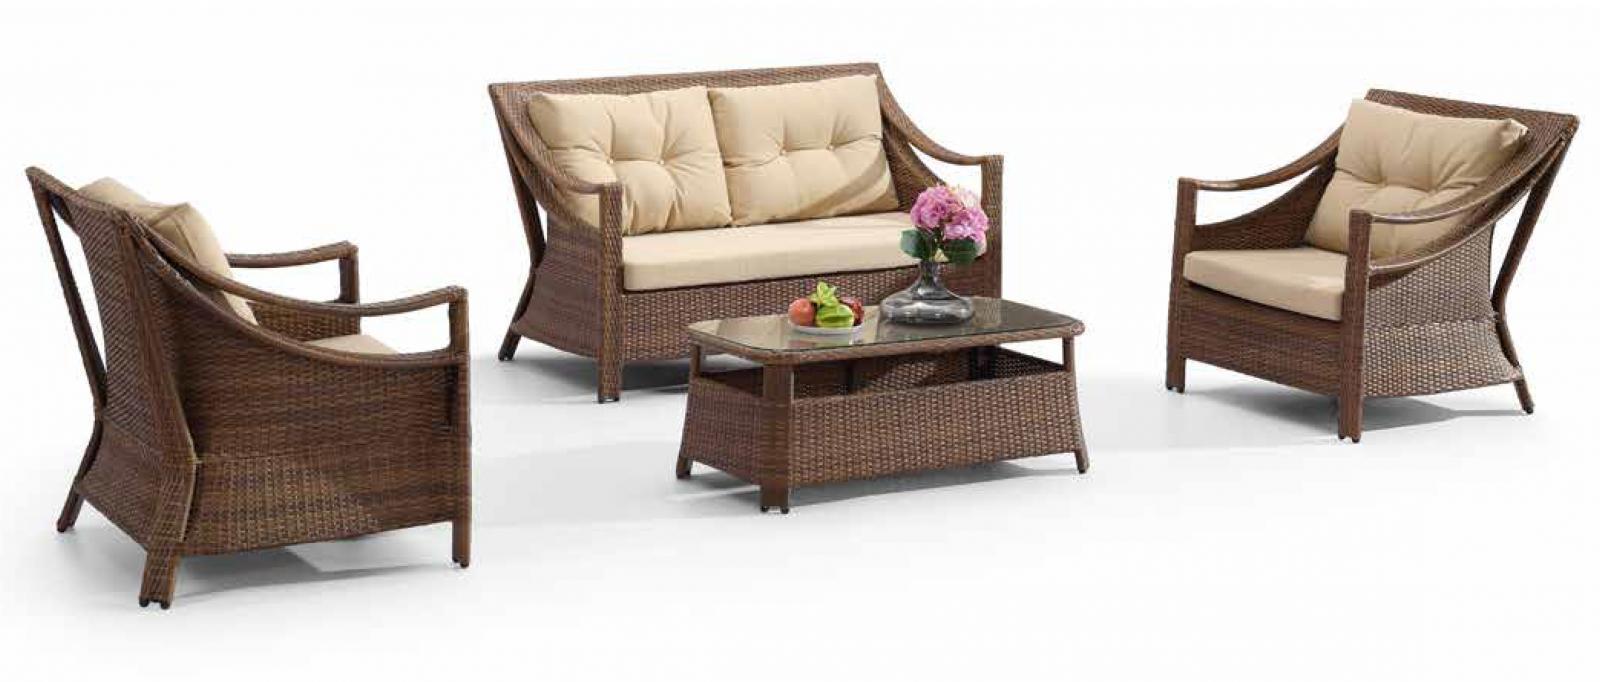 Комплект плетеной мебели Indiana